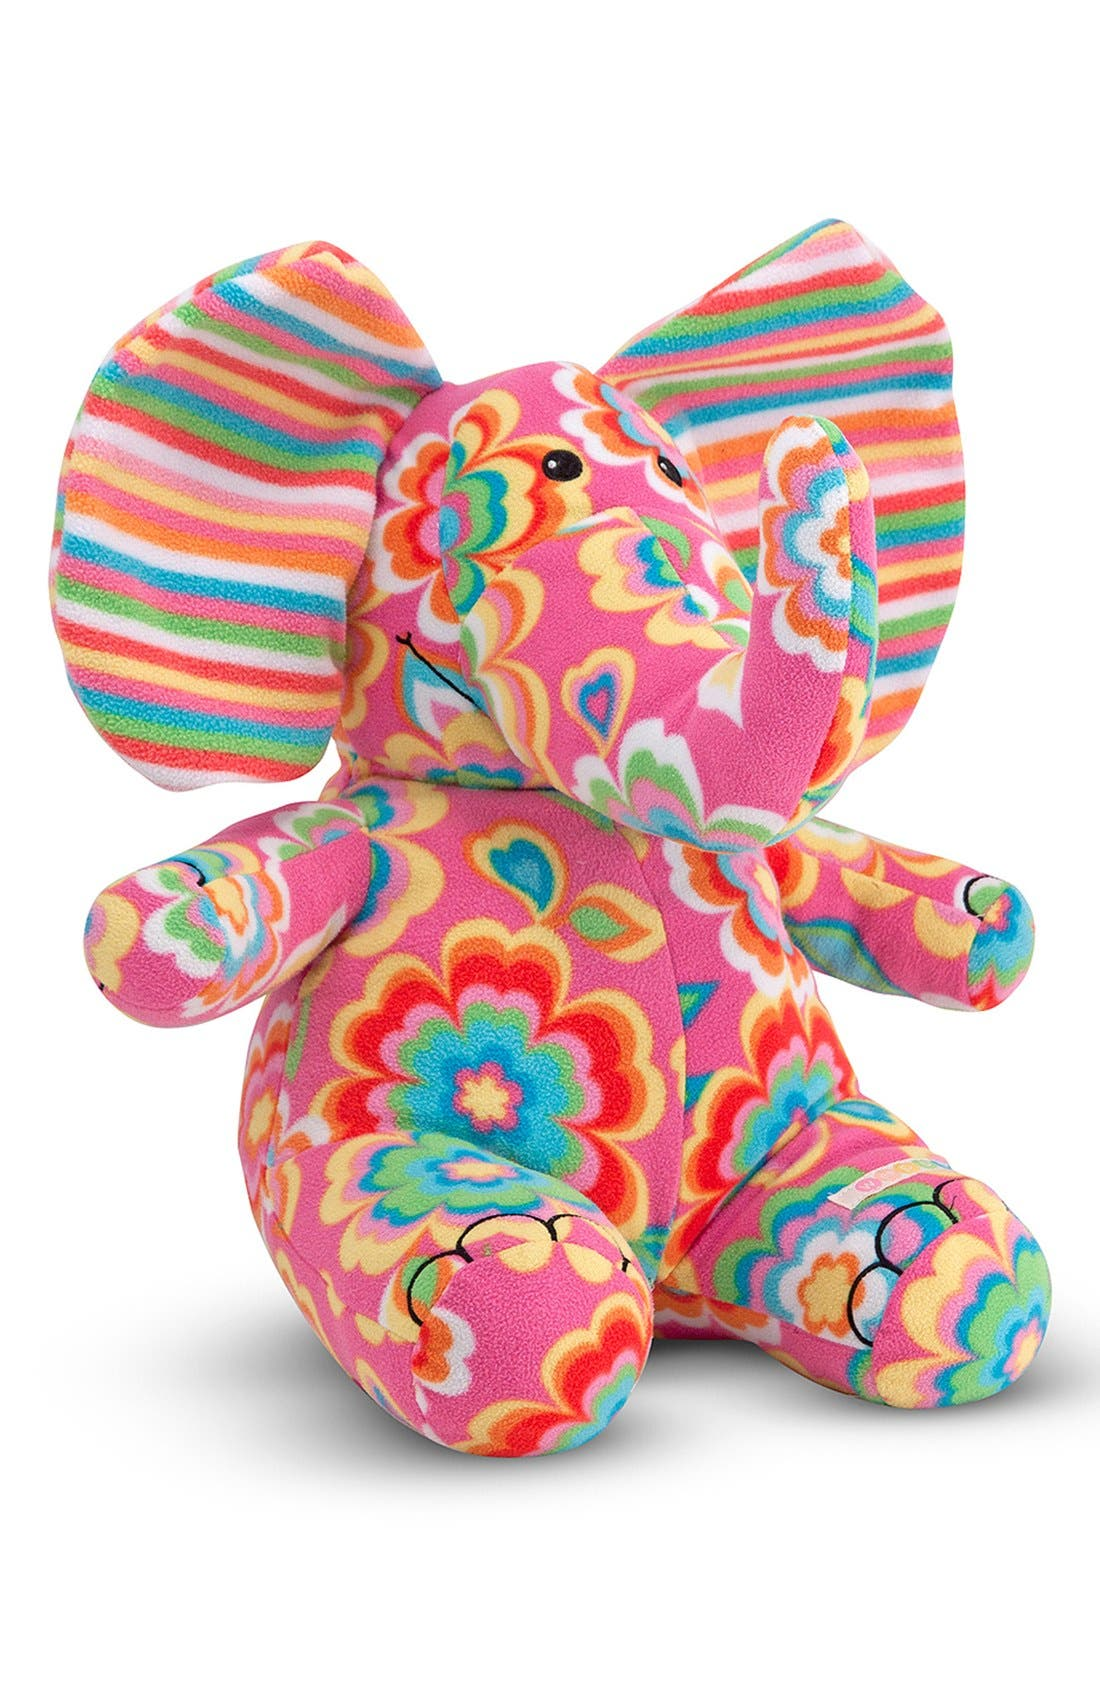 Melissa & Doug 'Beeposh - Sally Elephant' Plush Toy